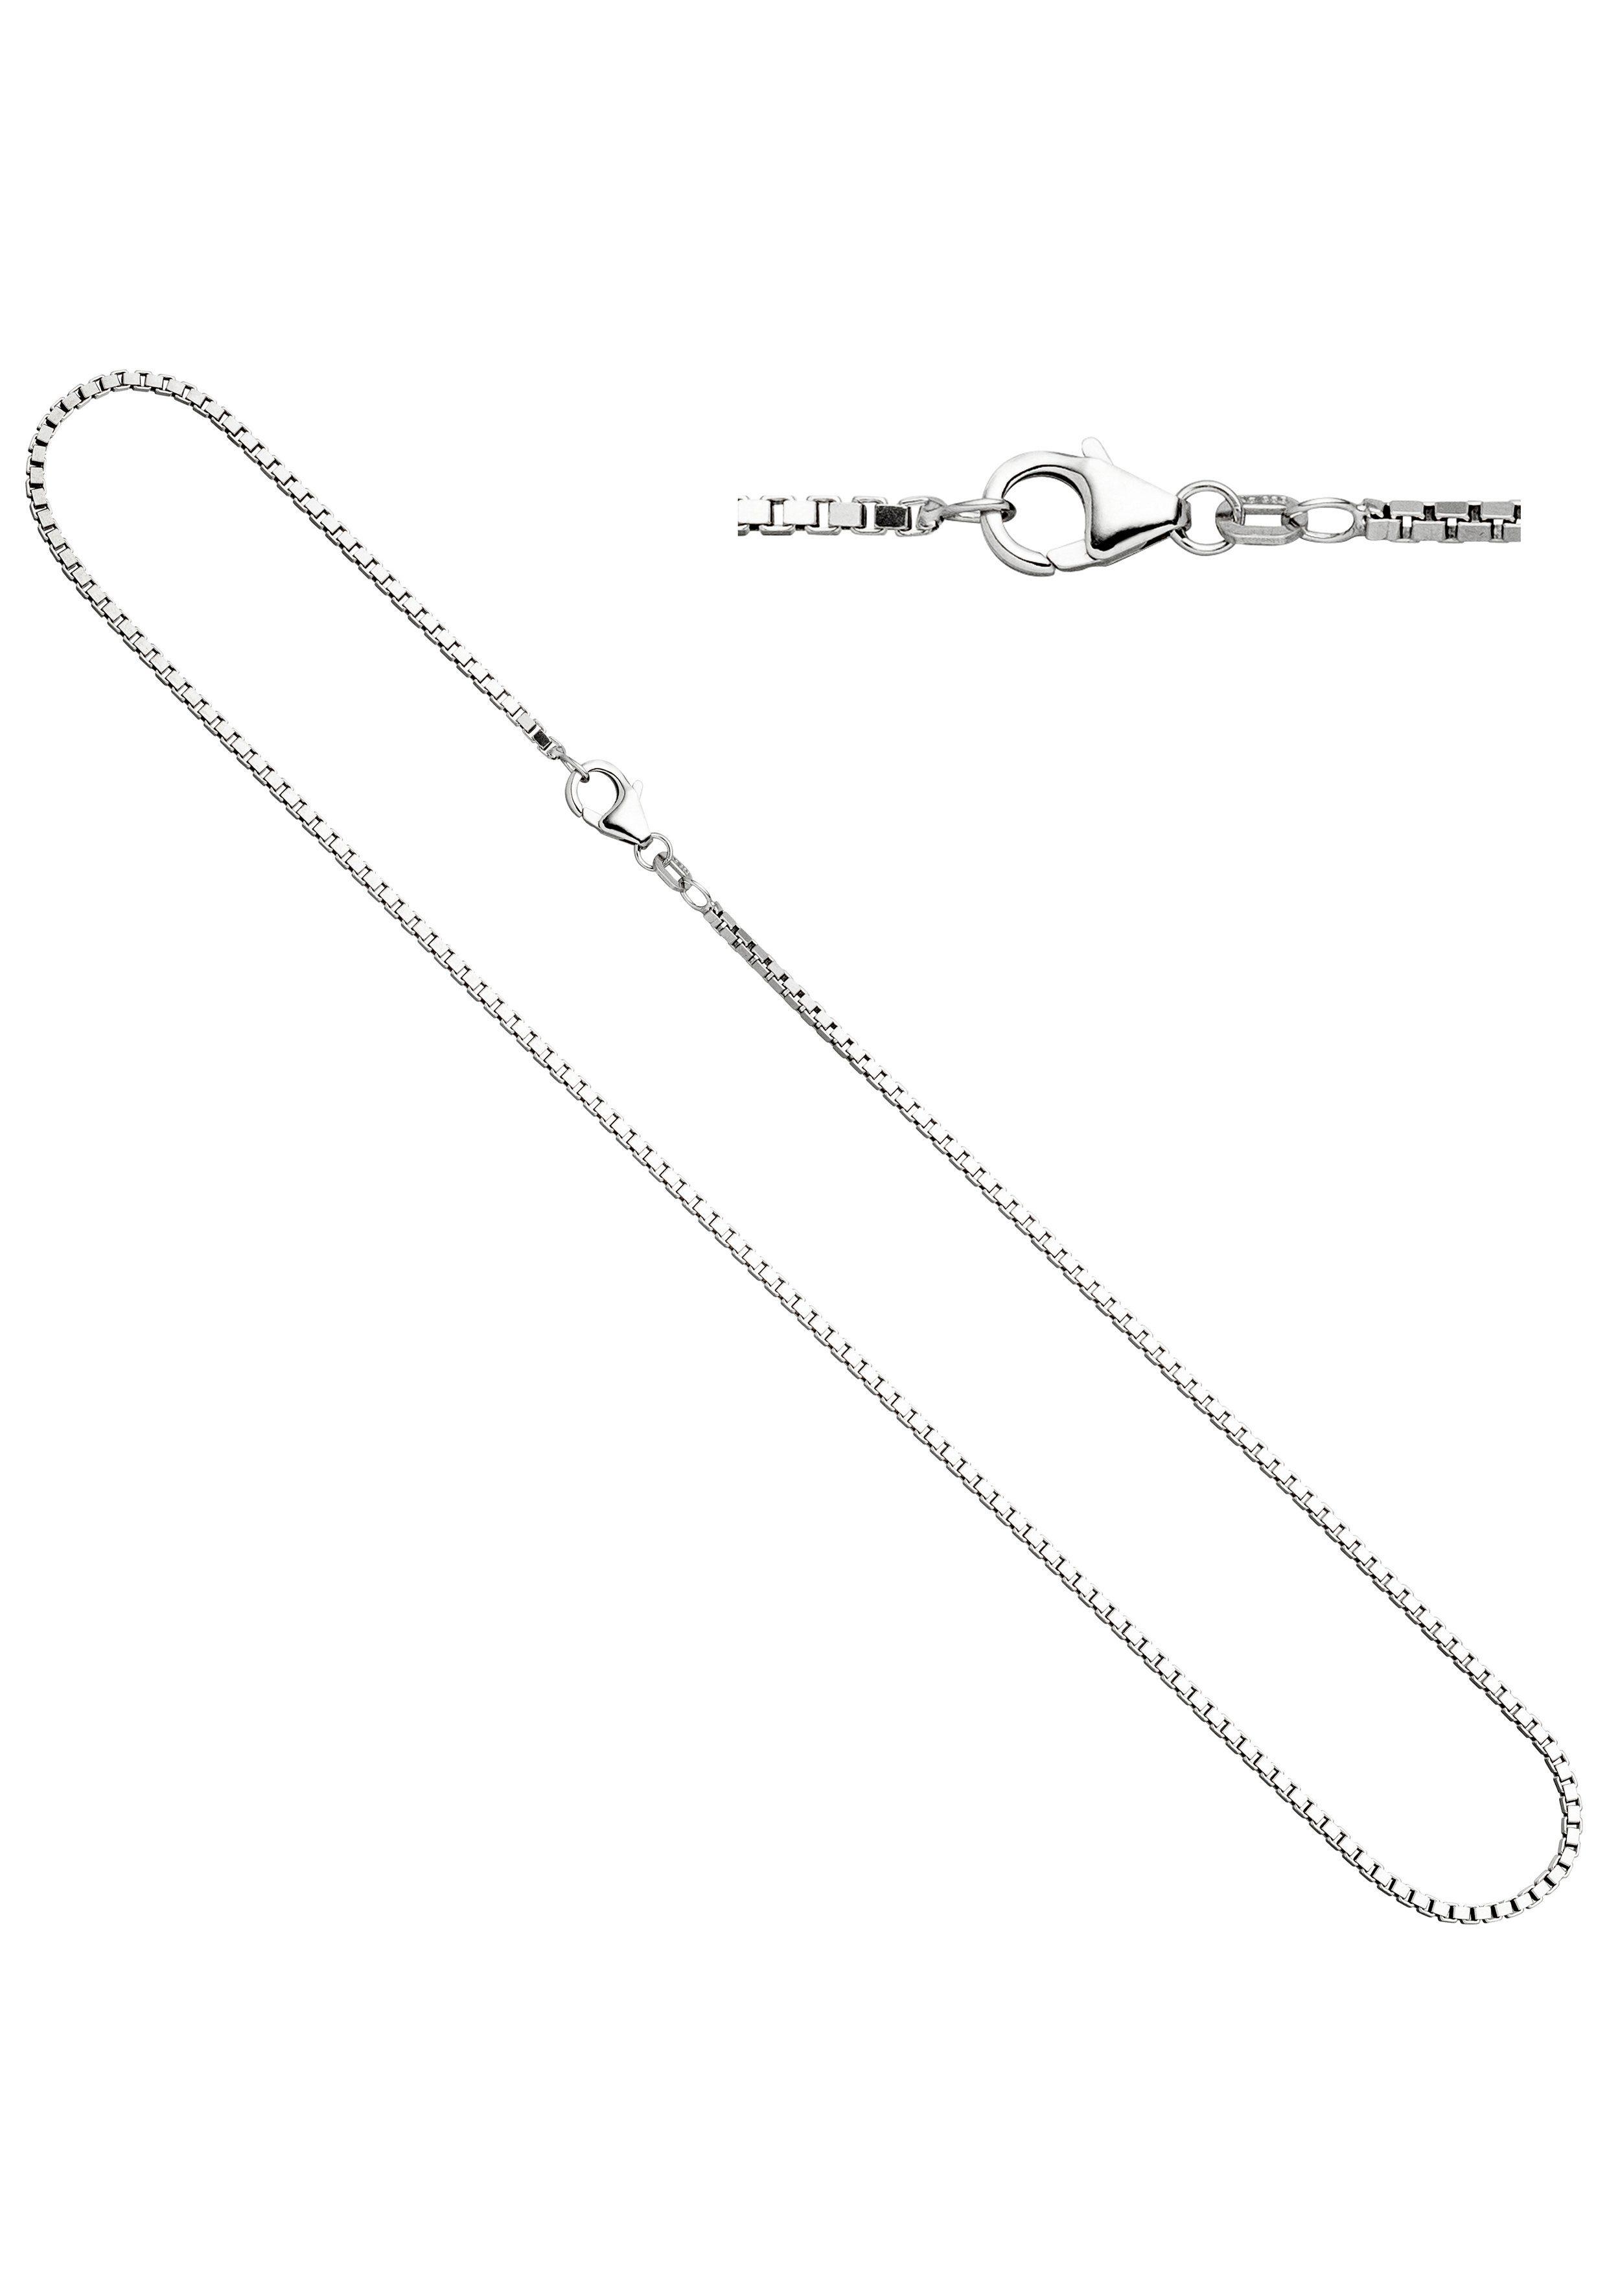 JOBO Silberkette Venezianerkette 925 Silber 50 cm 1,8 mm